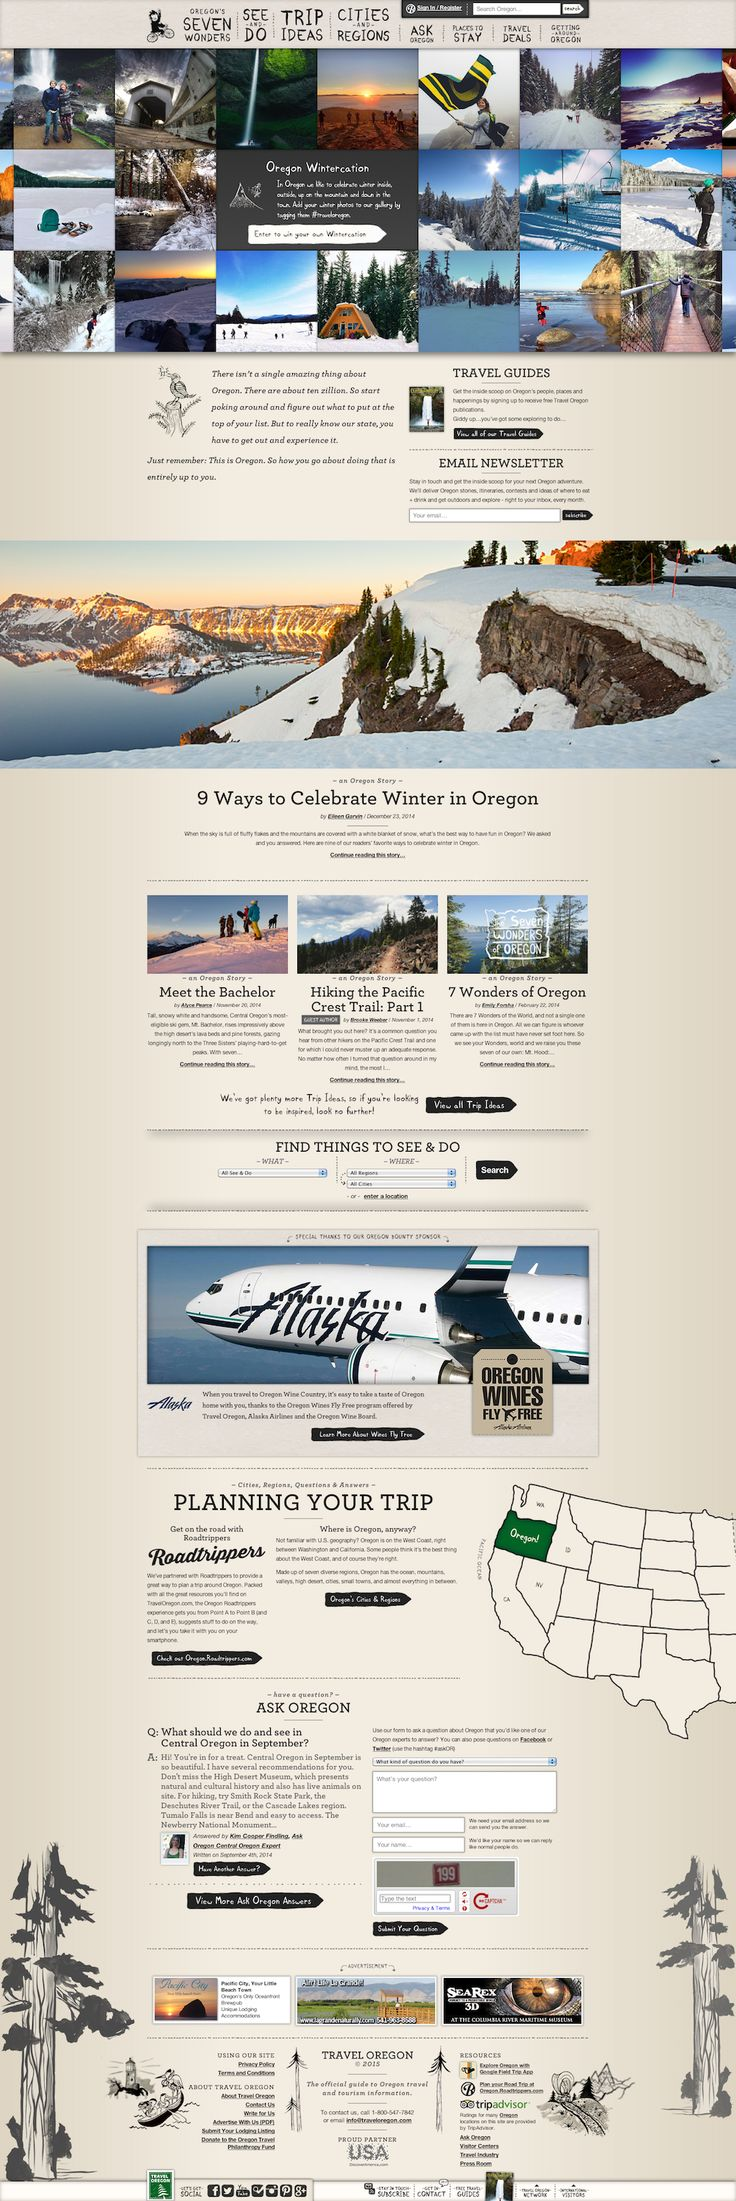 Oregon tourism website #travel #tan #photography #gray